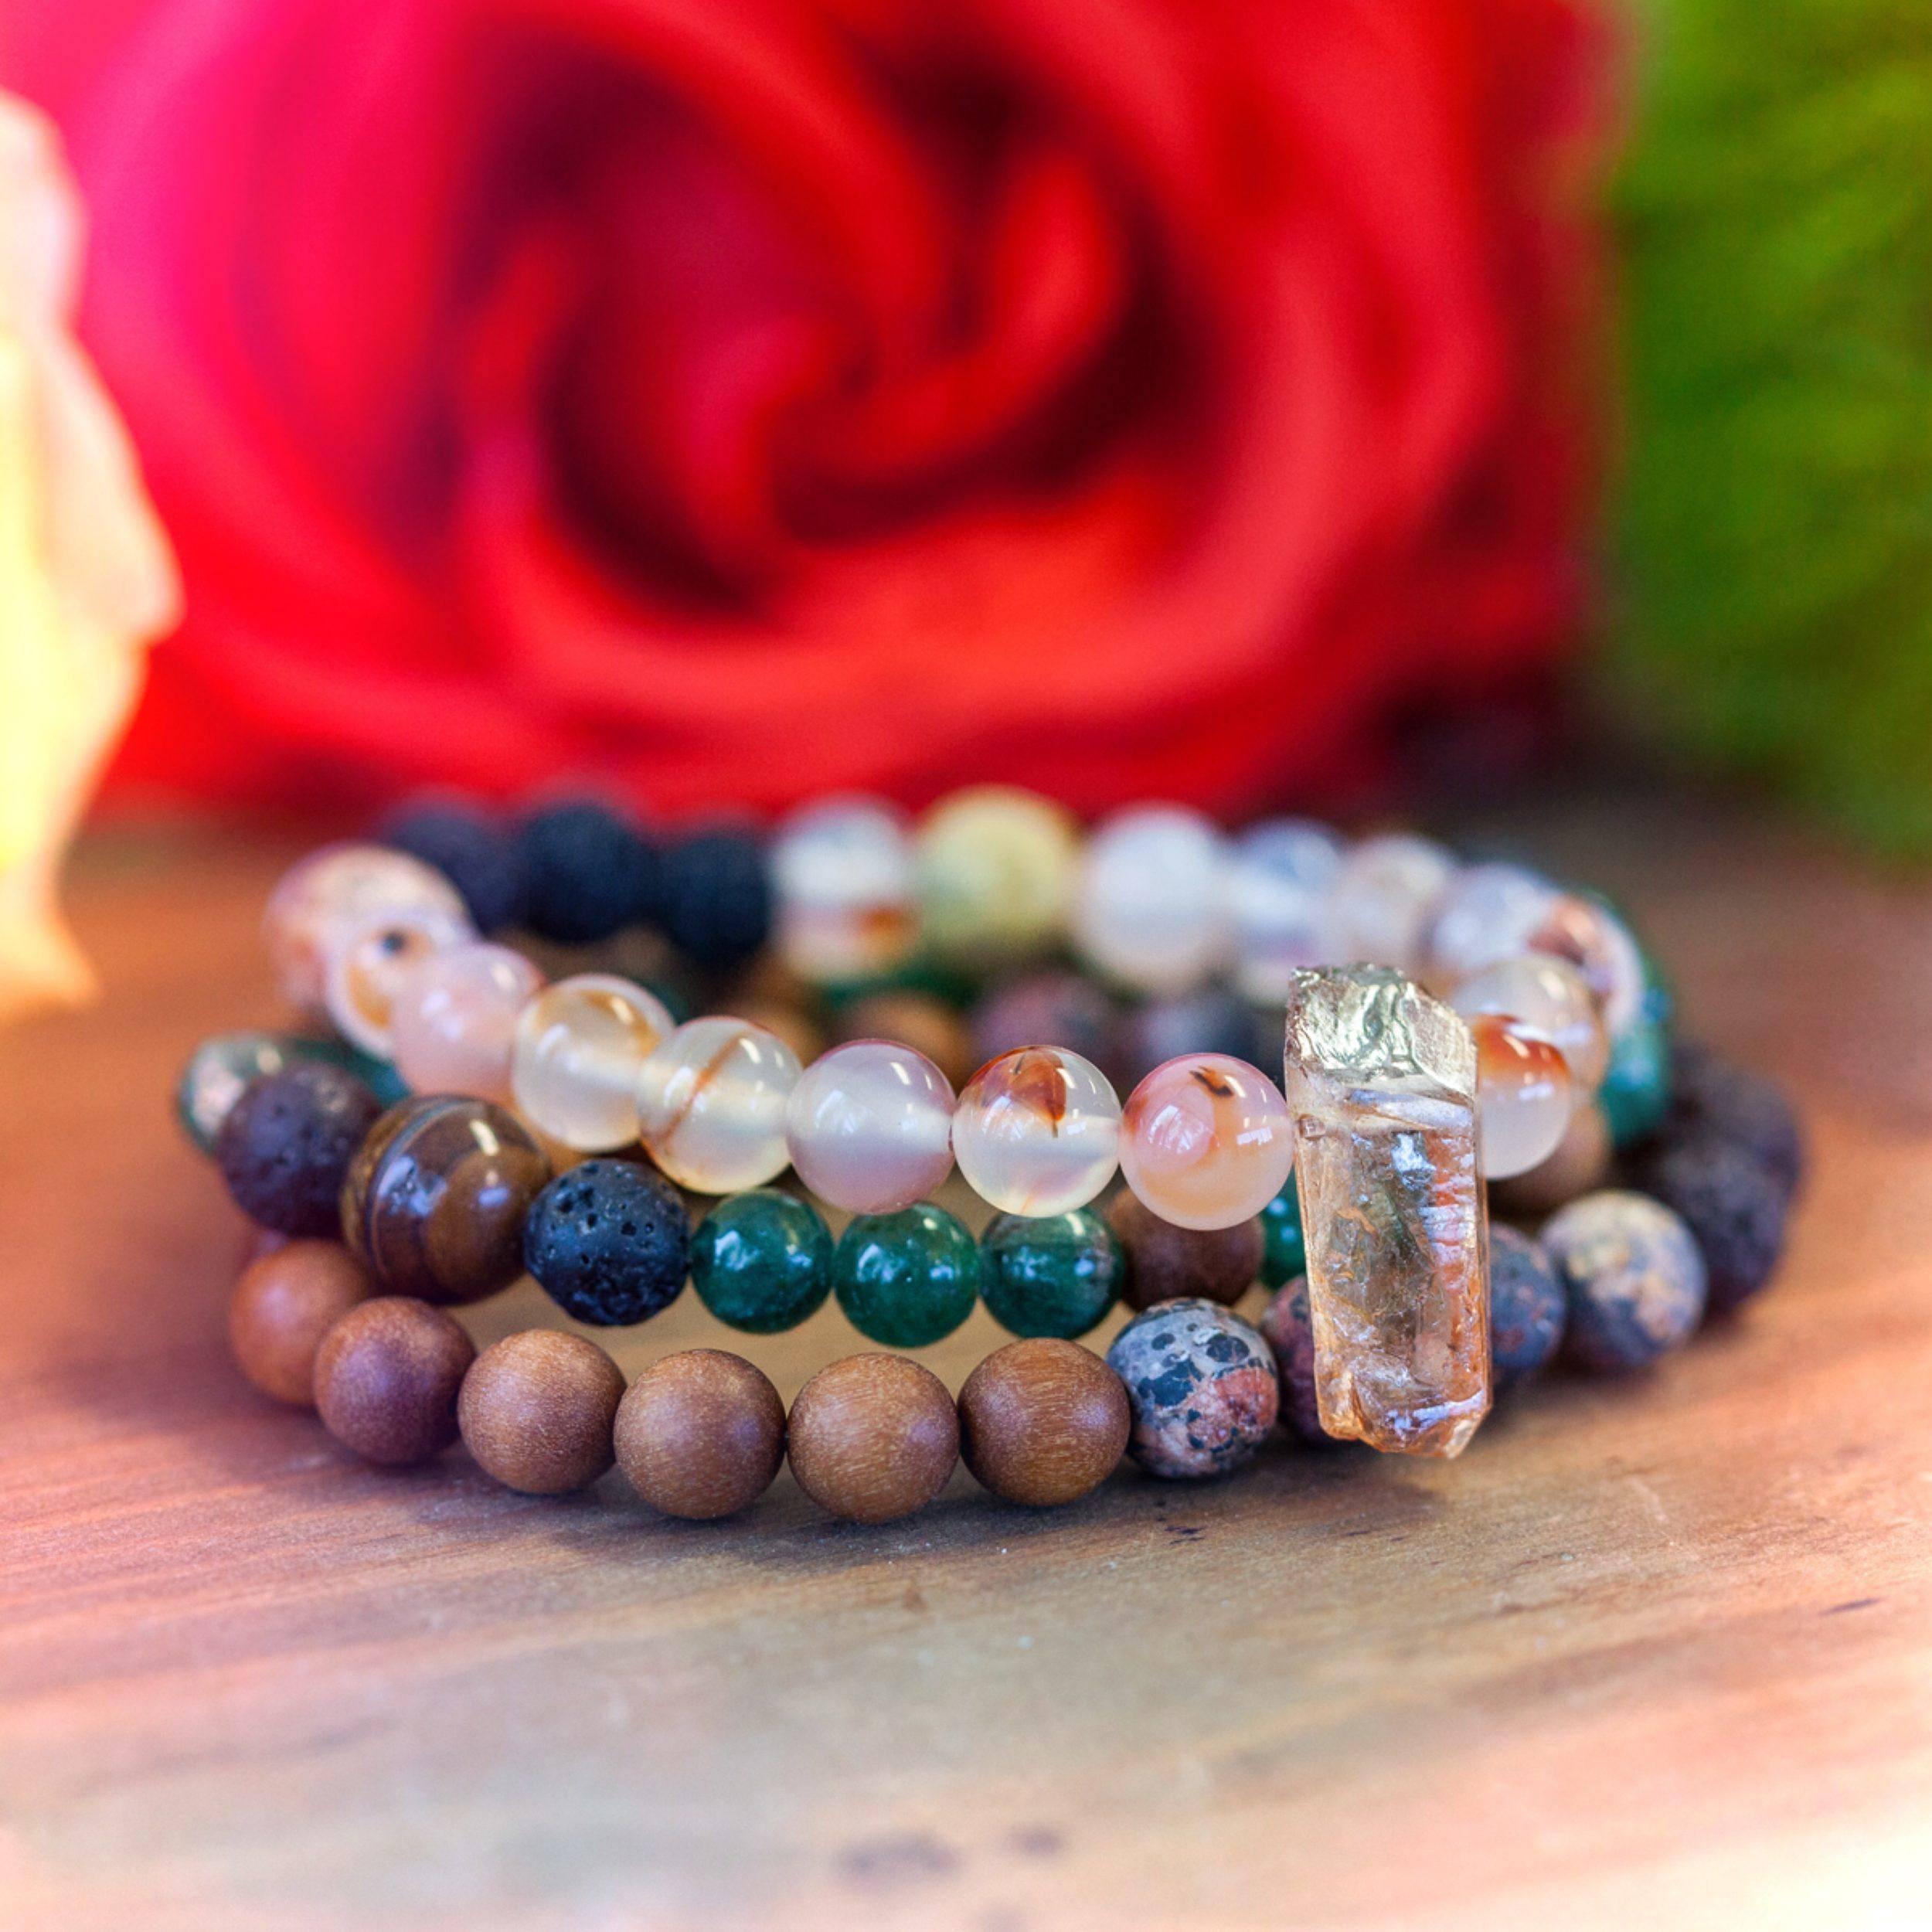 Intuitive_Handmade_SG_Bracelets_2of3_8_9